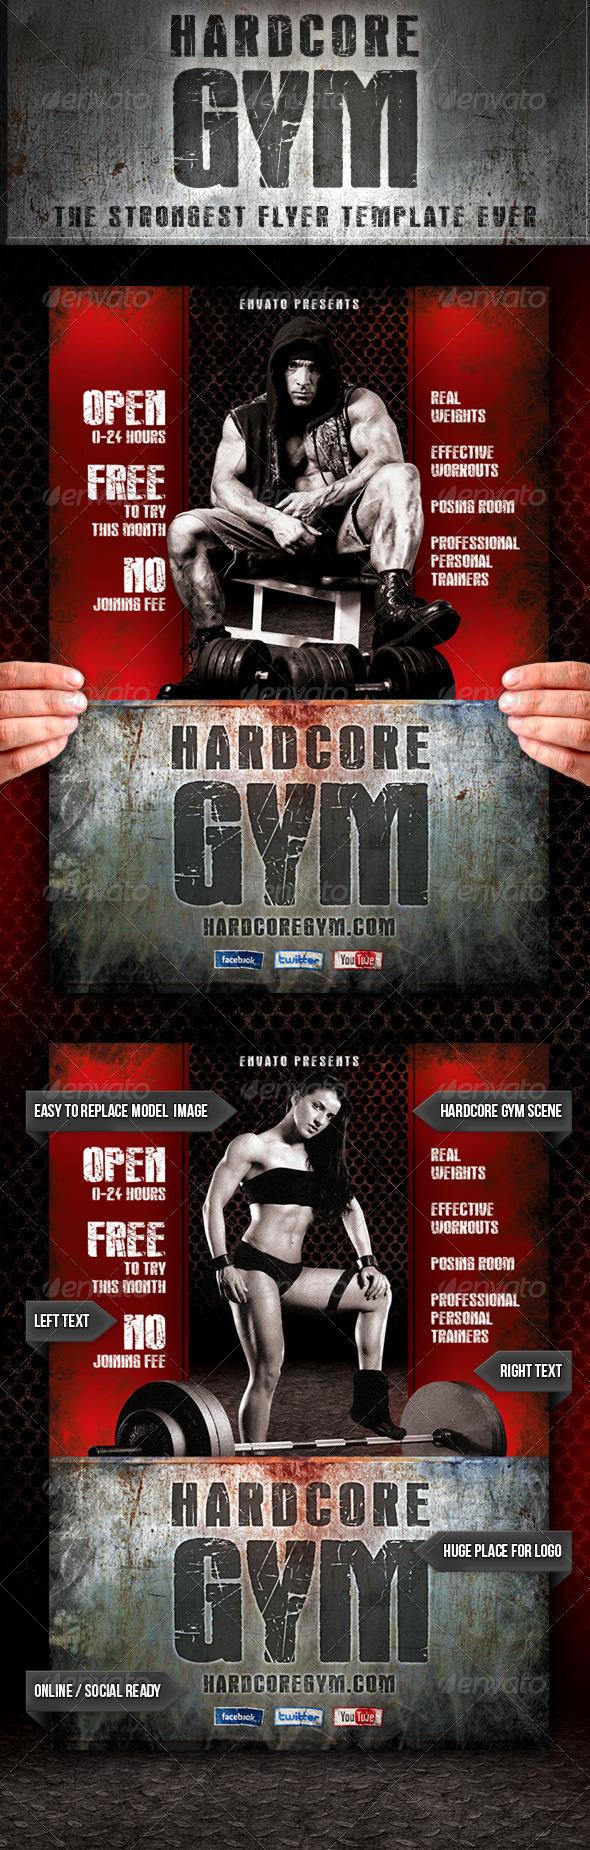 Hardcore Gym Flyer - Commerce Flyers